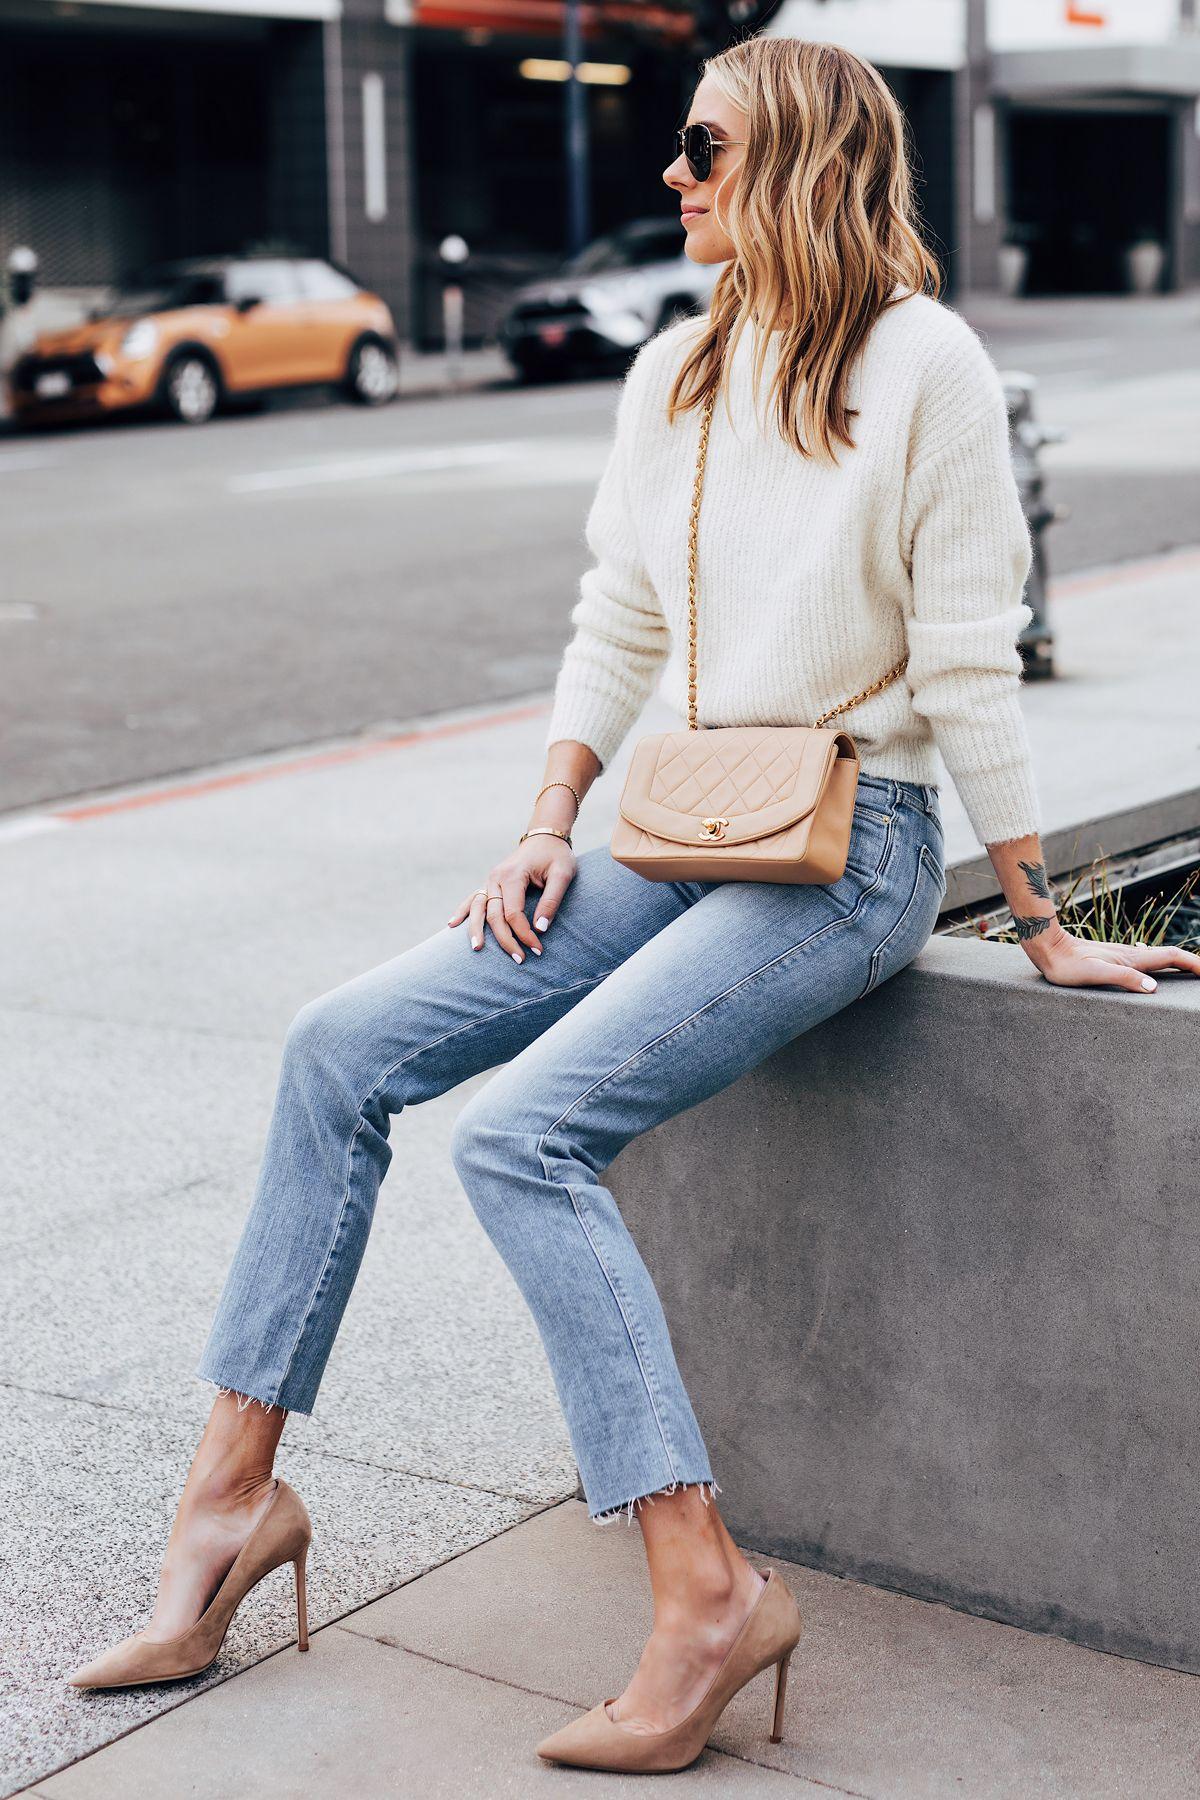 ef4877ece3b Fashion Jackson Wearing Ivory Sweater Frame Raw Hem Straight Leg Jeans  Jimmy Choo Romy Nude Pumps Chanel Tan Diana Bag 1